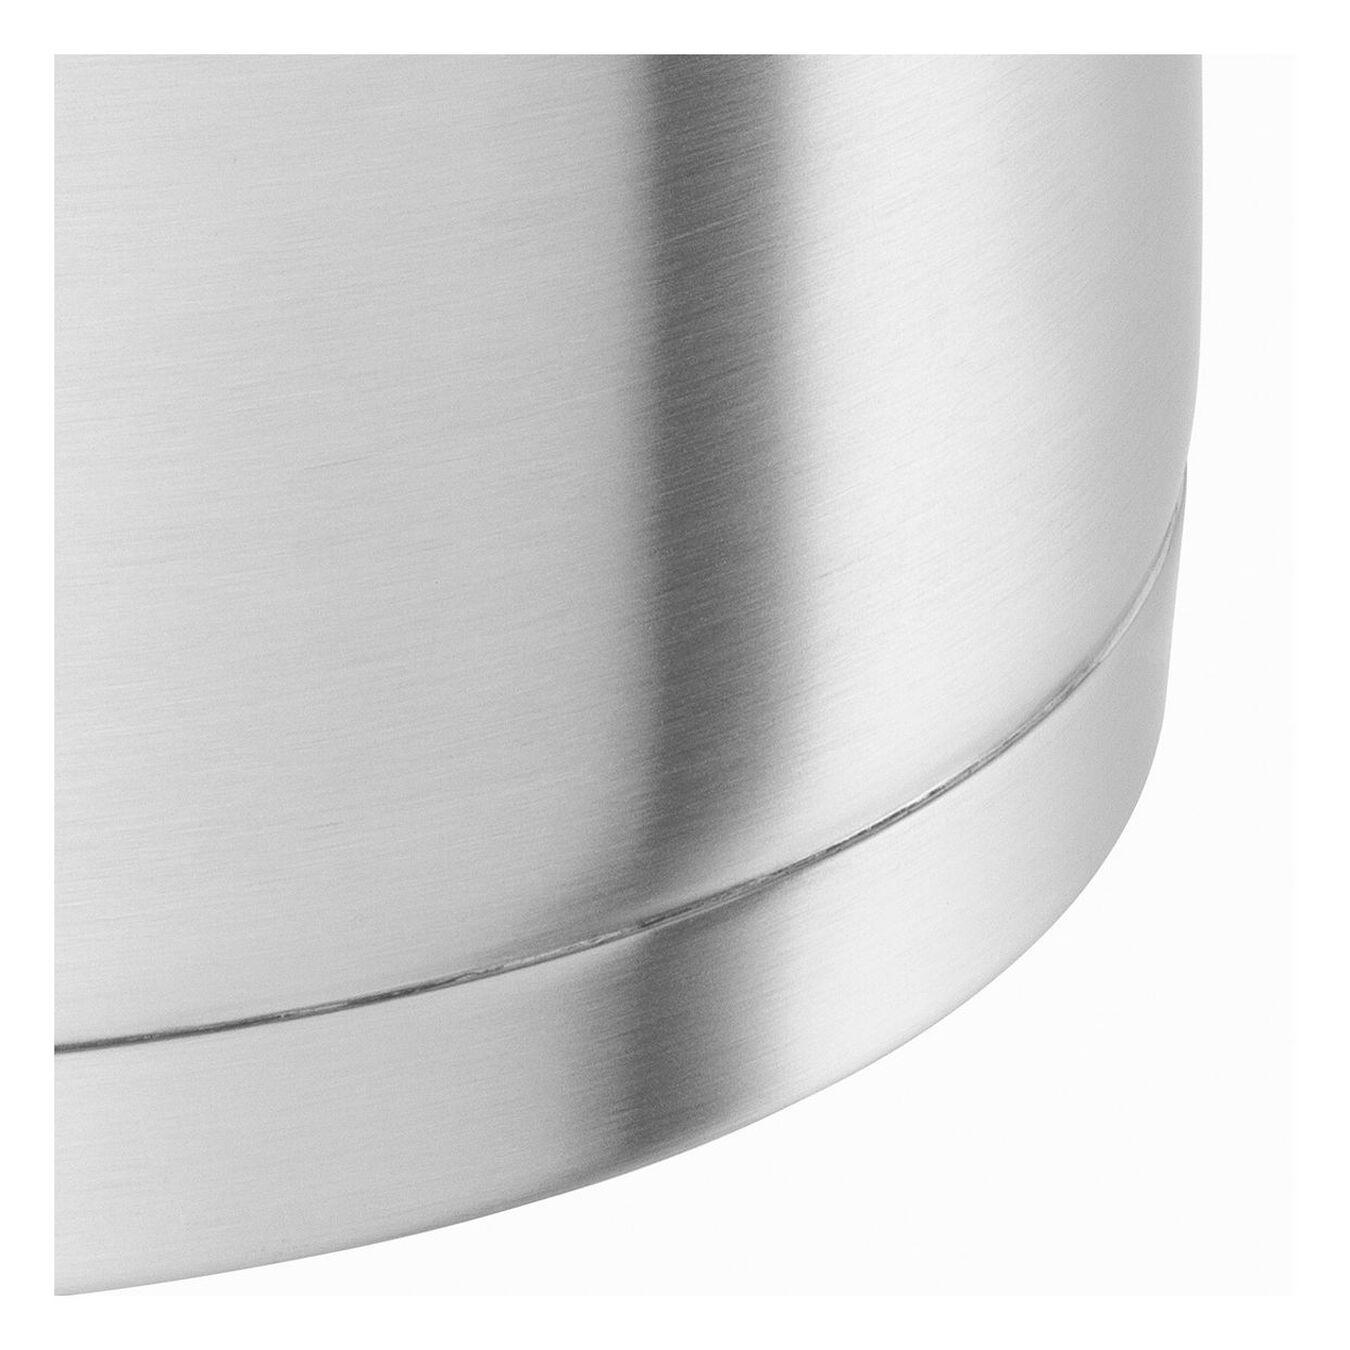 Set di pentole - 5-pz., 18/10 acciaio inossidabile,,large 5